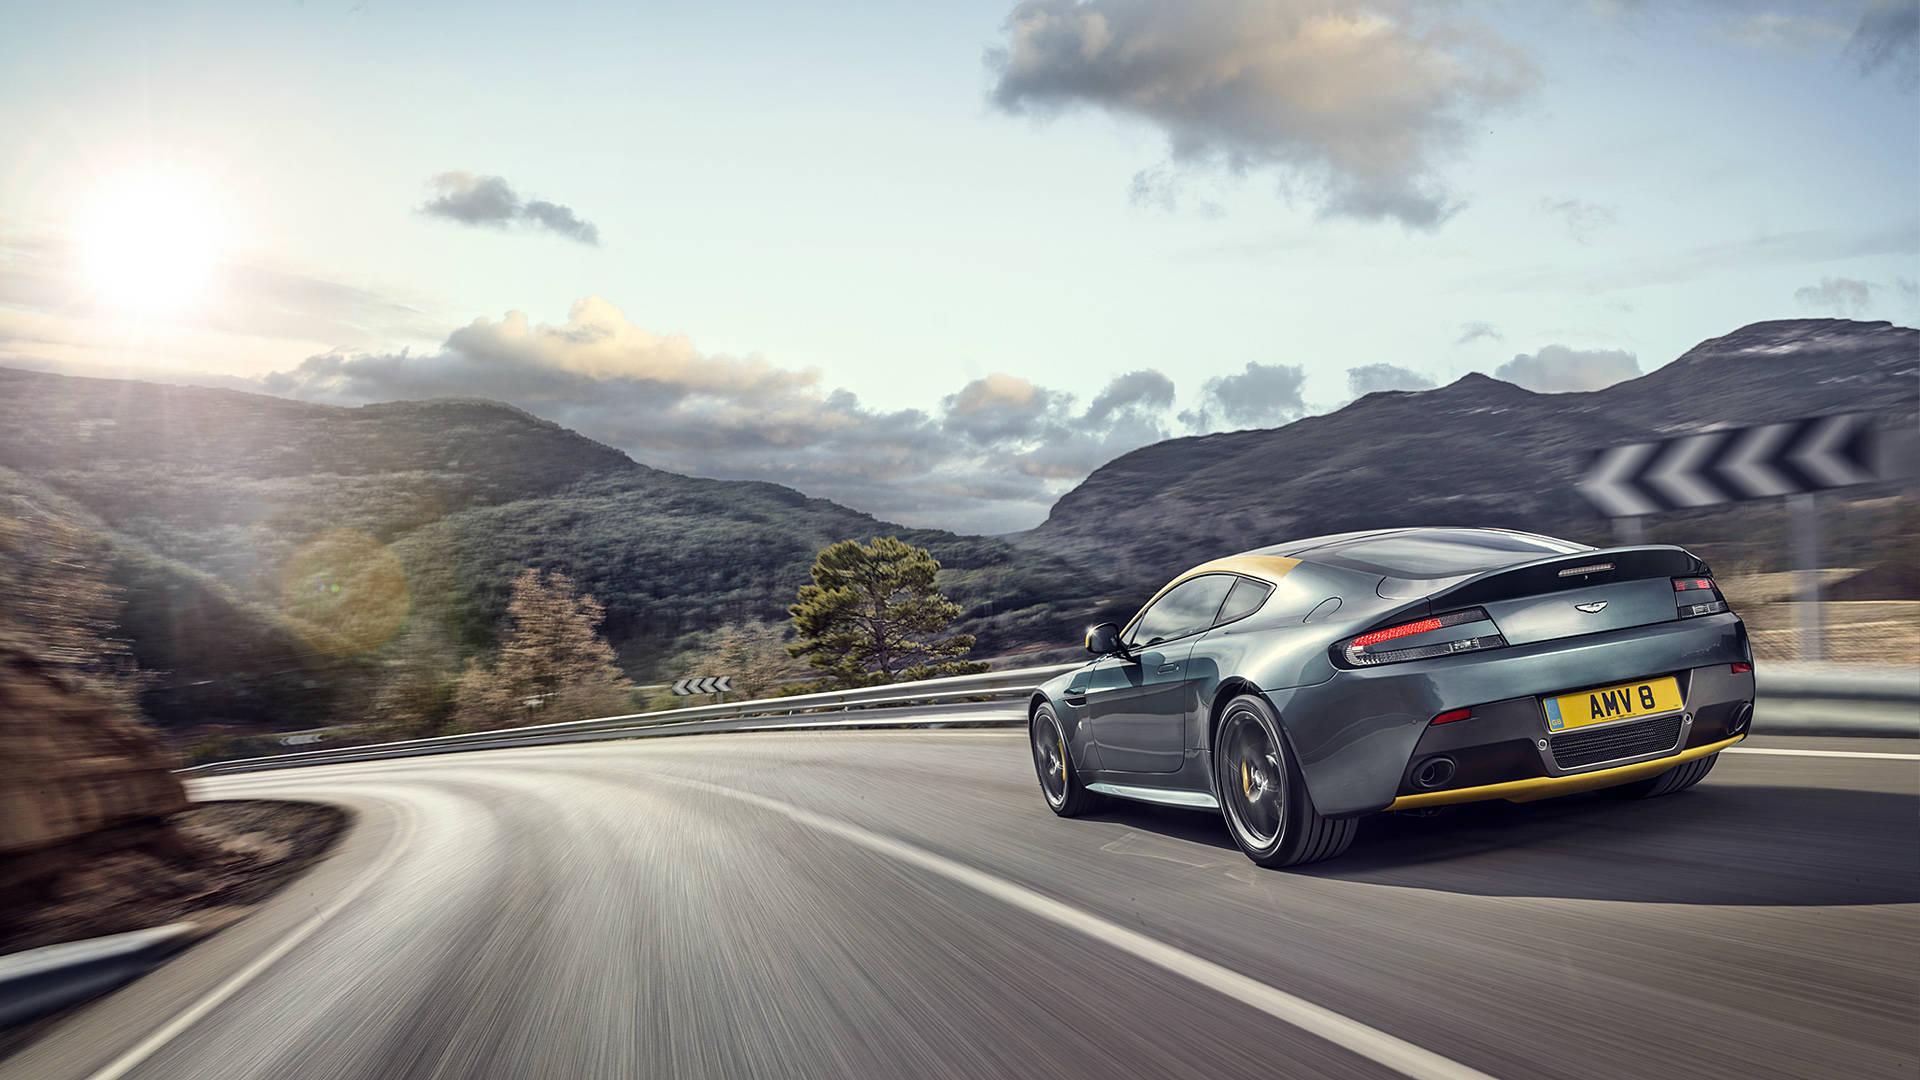 2015 Aston Martin V8 Vantage N430 Car Hd Wallpaper   HD 1920x1080